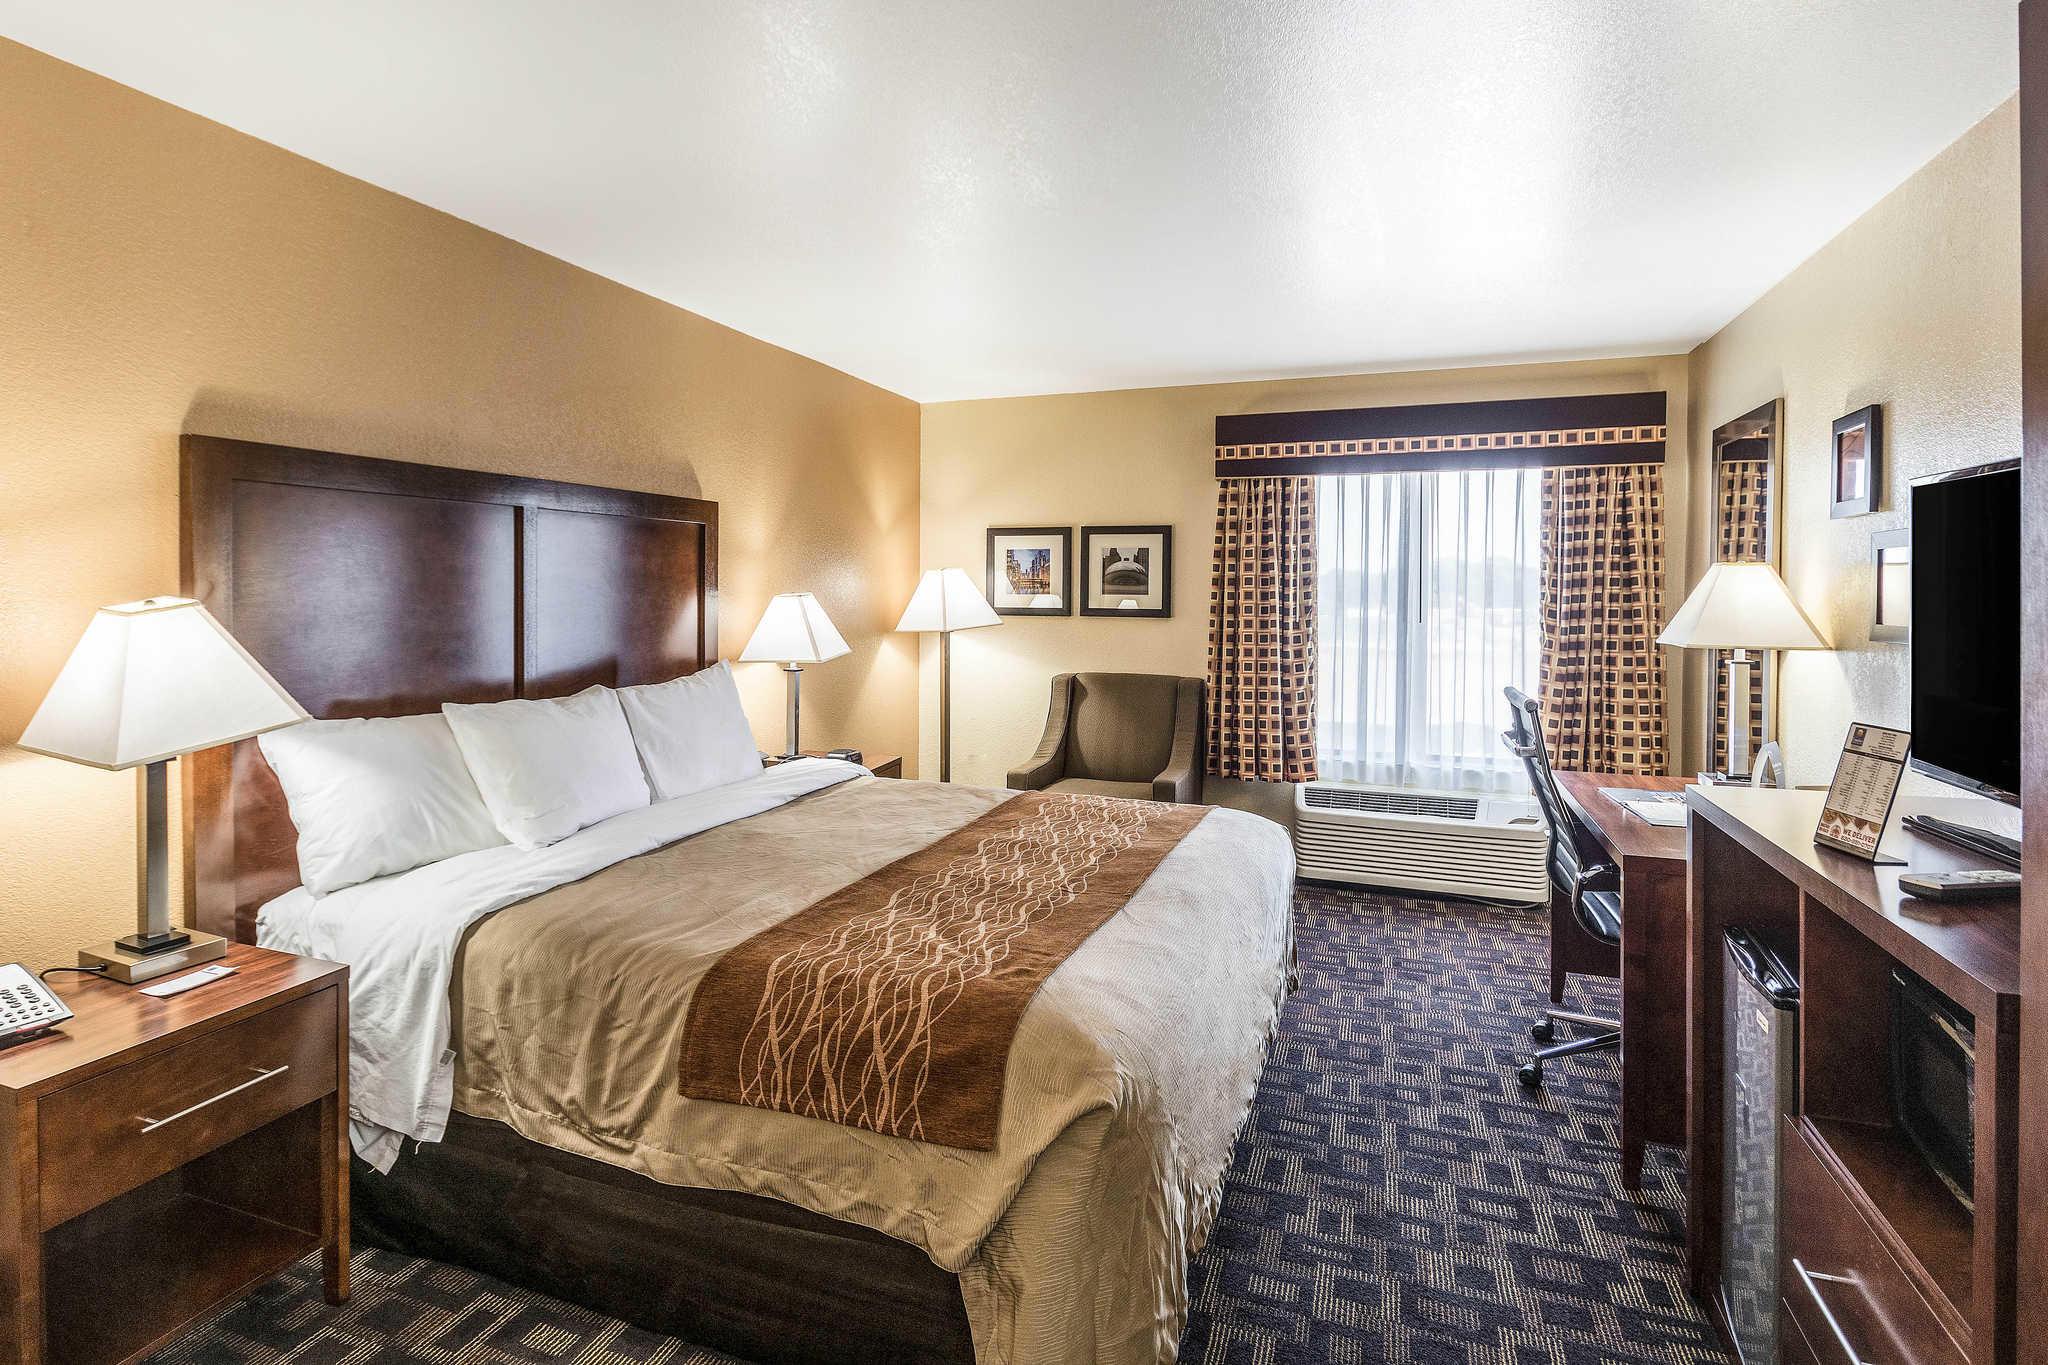 Comfort Inn & Suites North Aurora - Naperville image 18